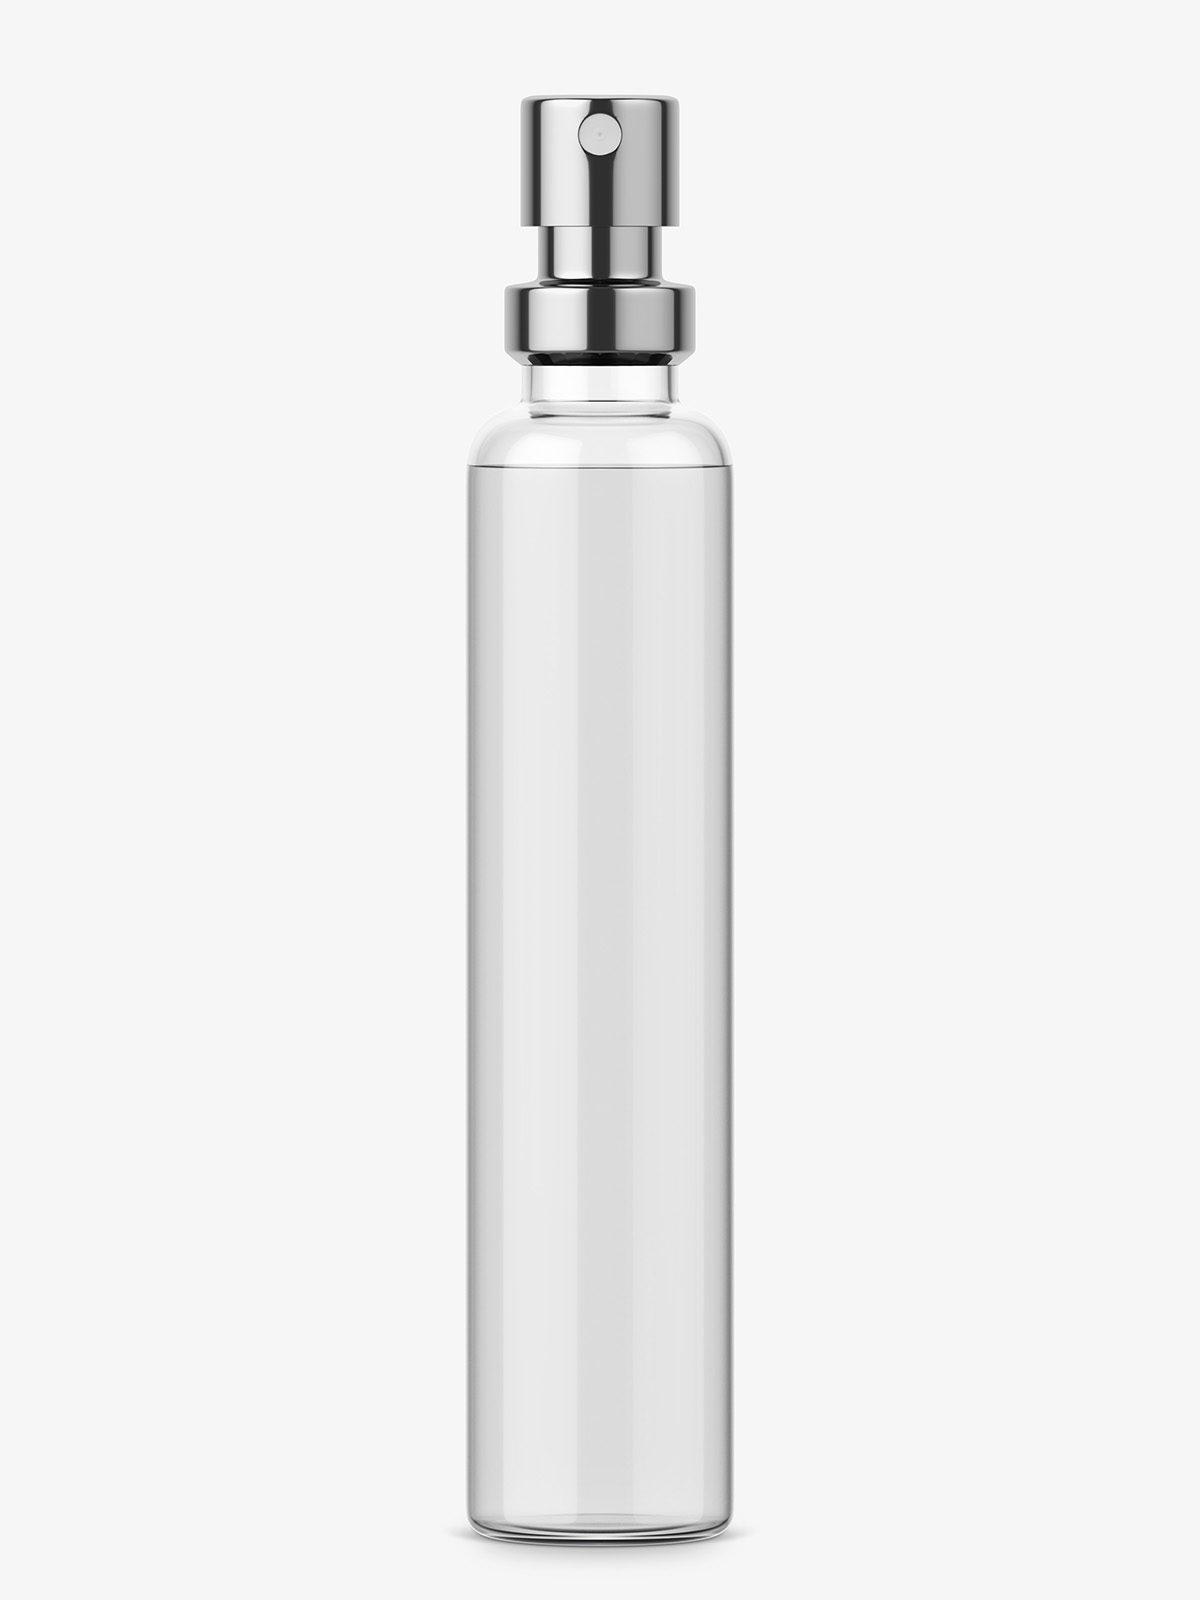 Perfume bottle sample mockup